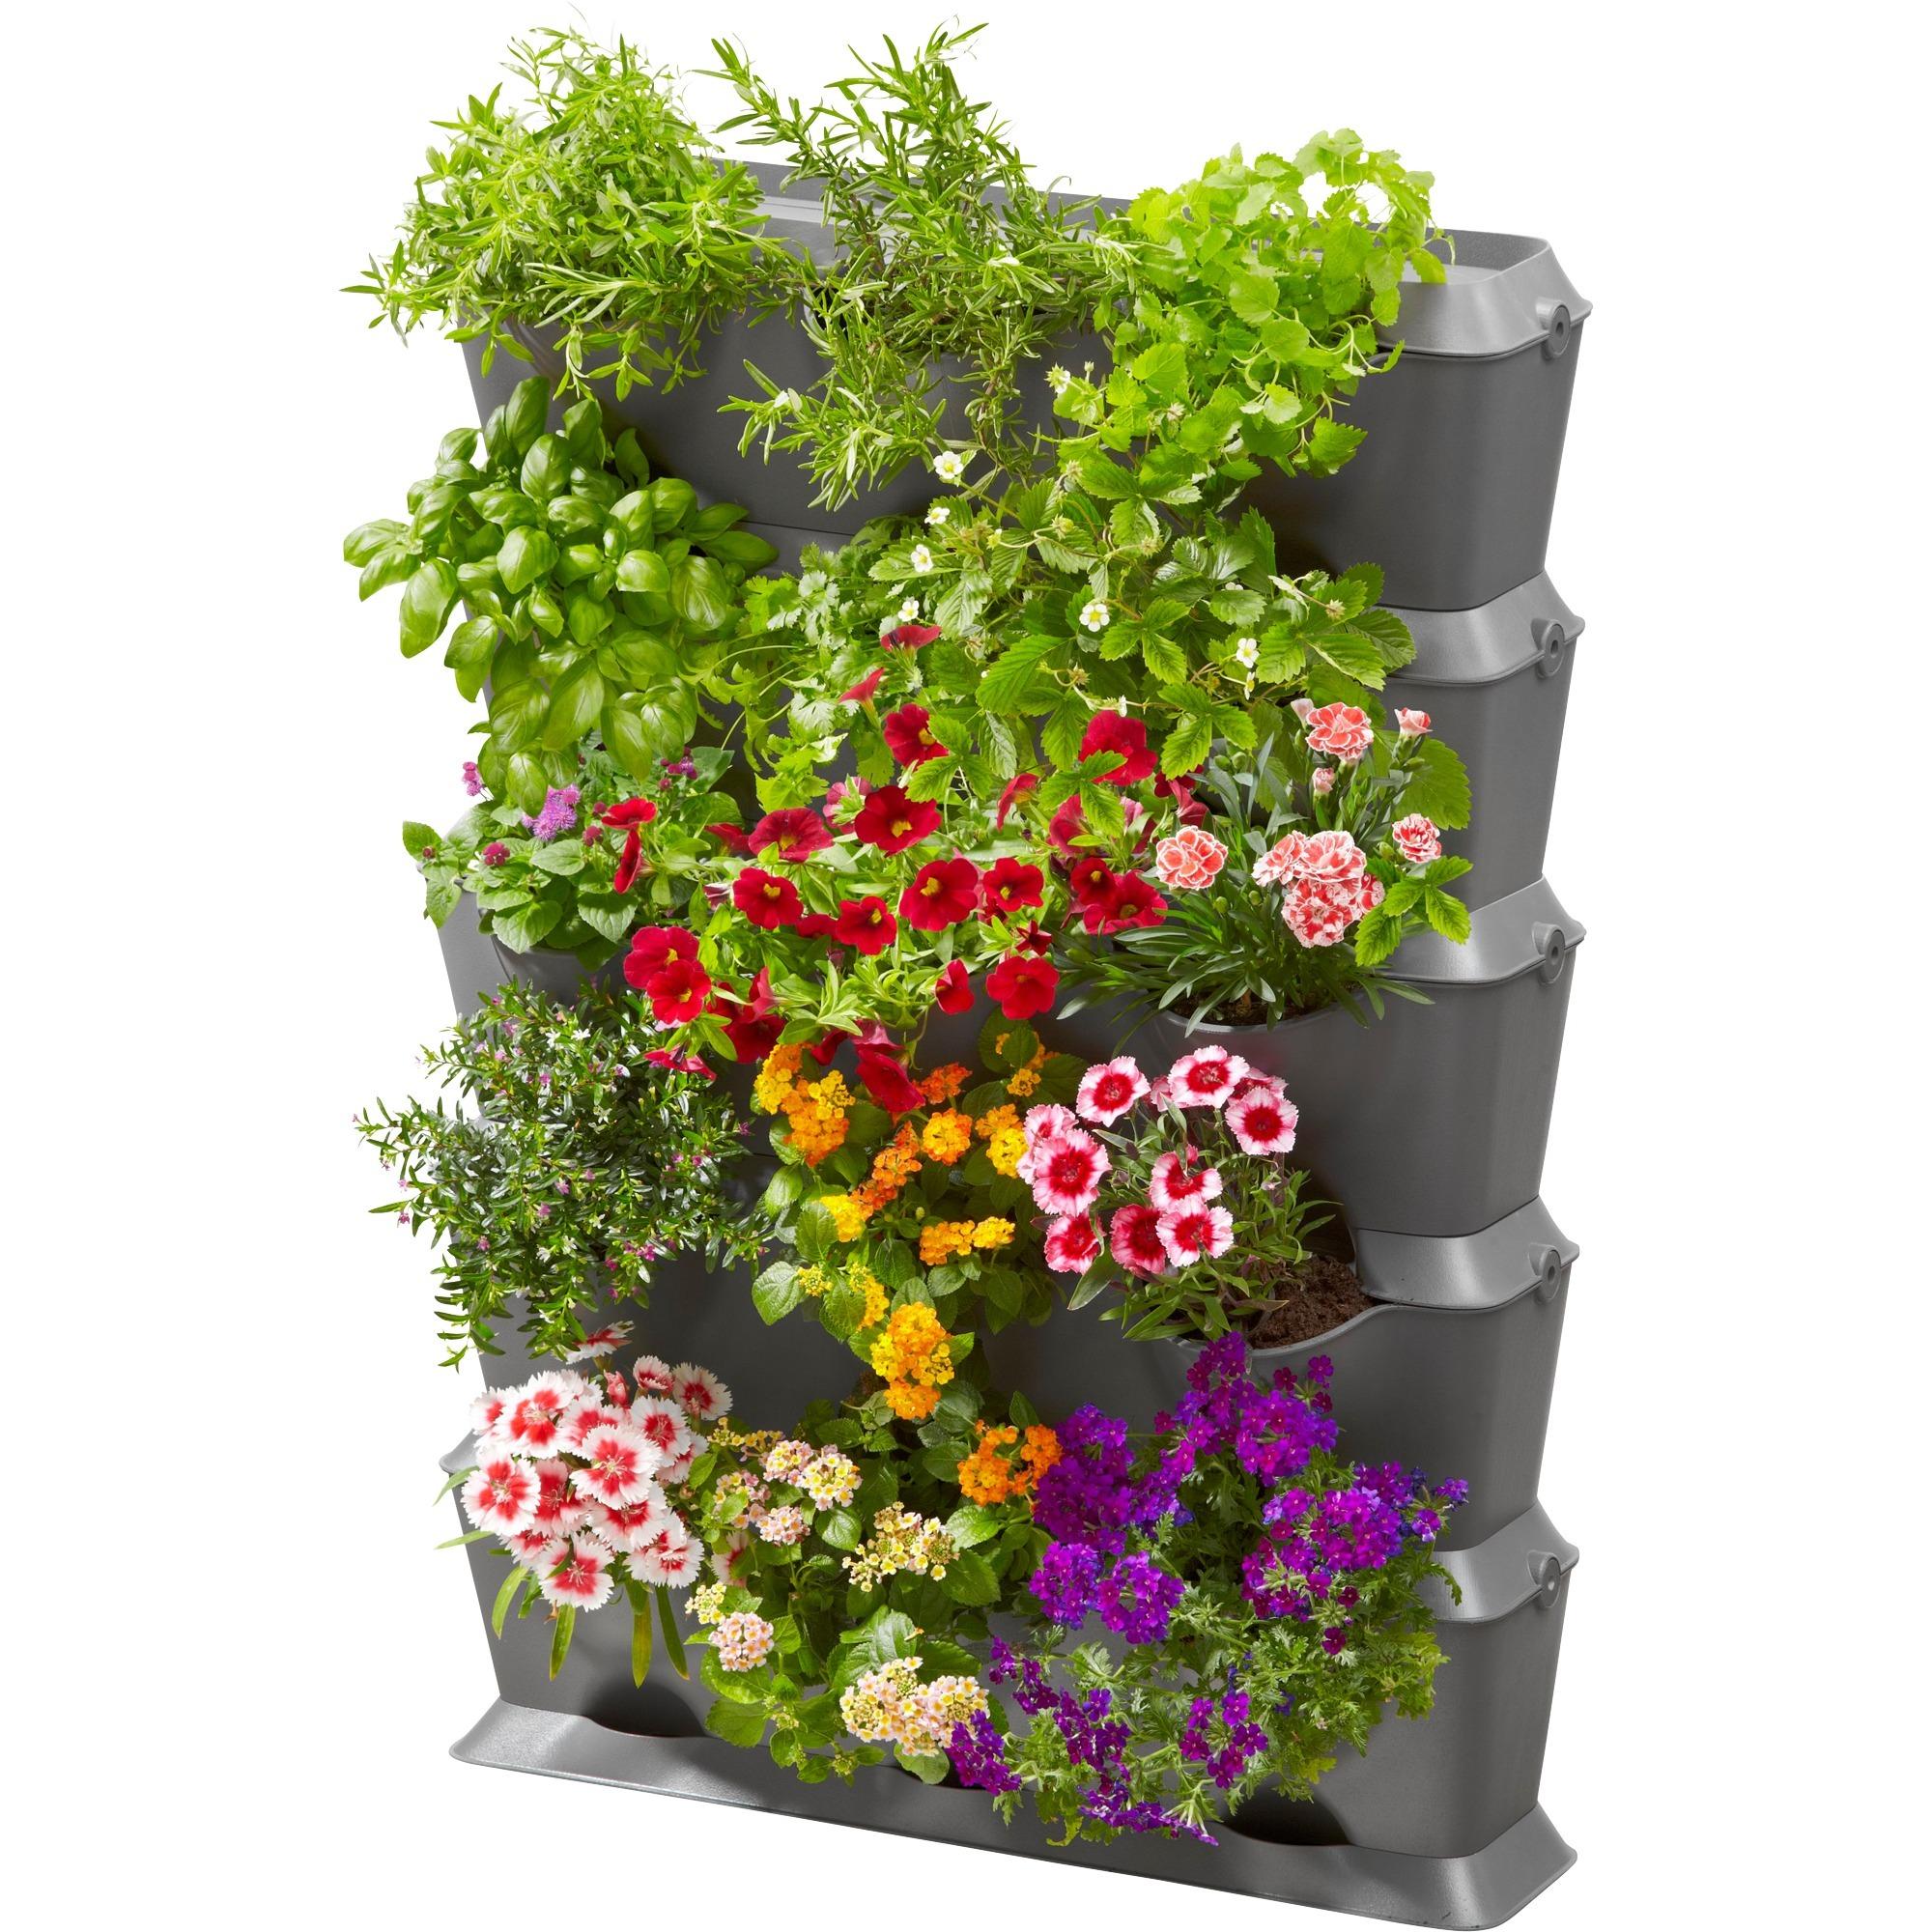 Fioriere Per Esterno Plastica.Gardena Natureup Fioriera Montabile A Parete Plastica Grigio